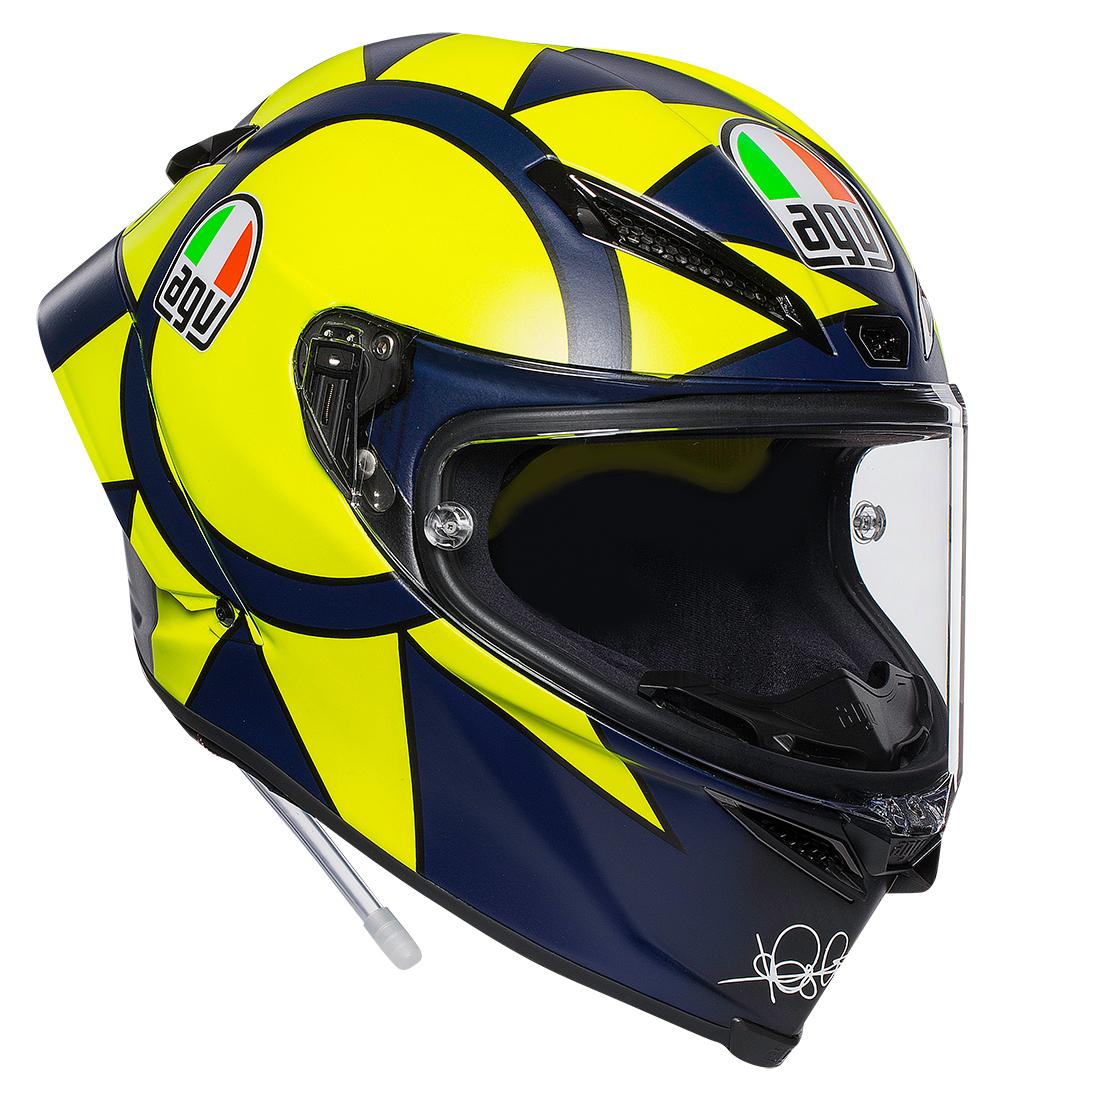 AGV PISTA GP RR 001-SOLELUNA 2019 フルフェイスヘルメット